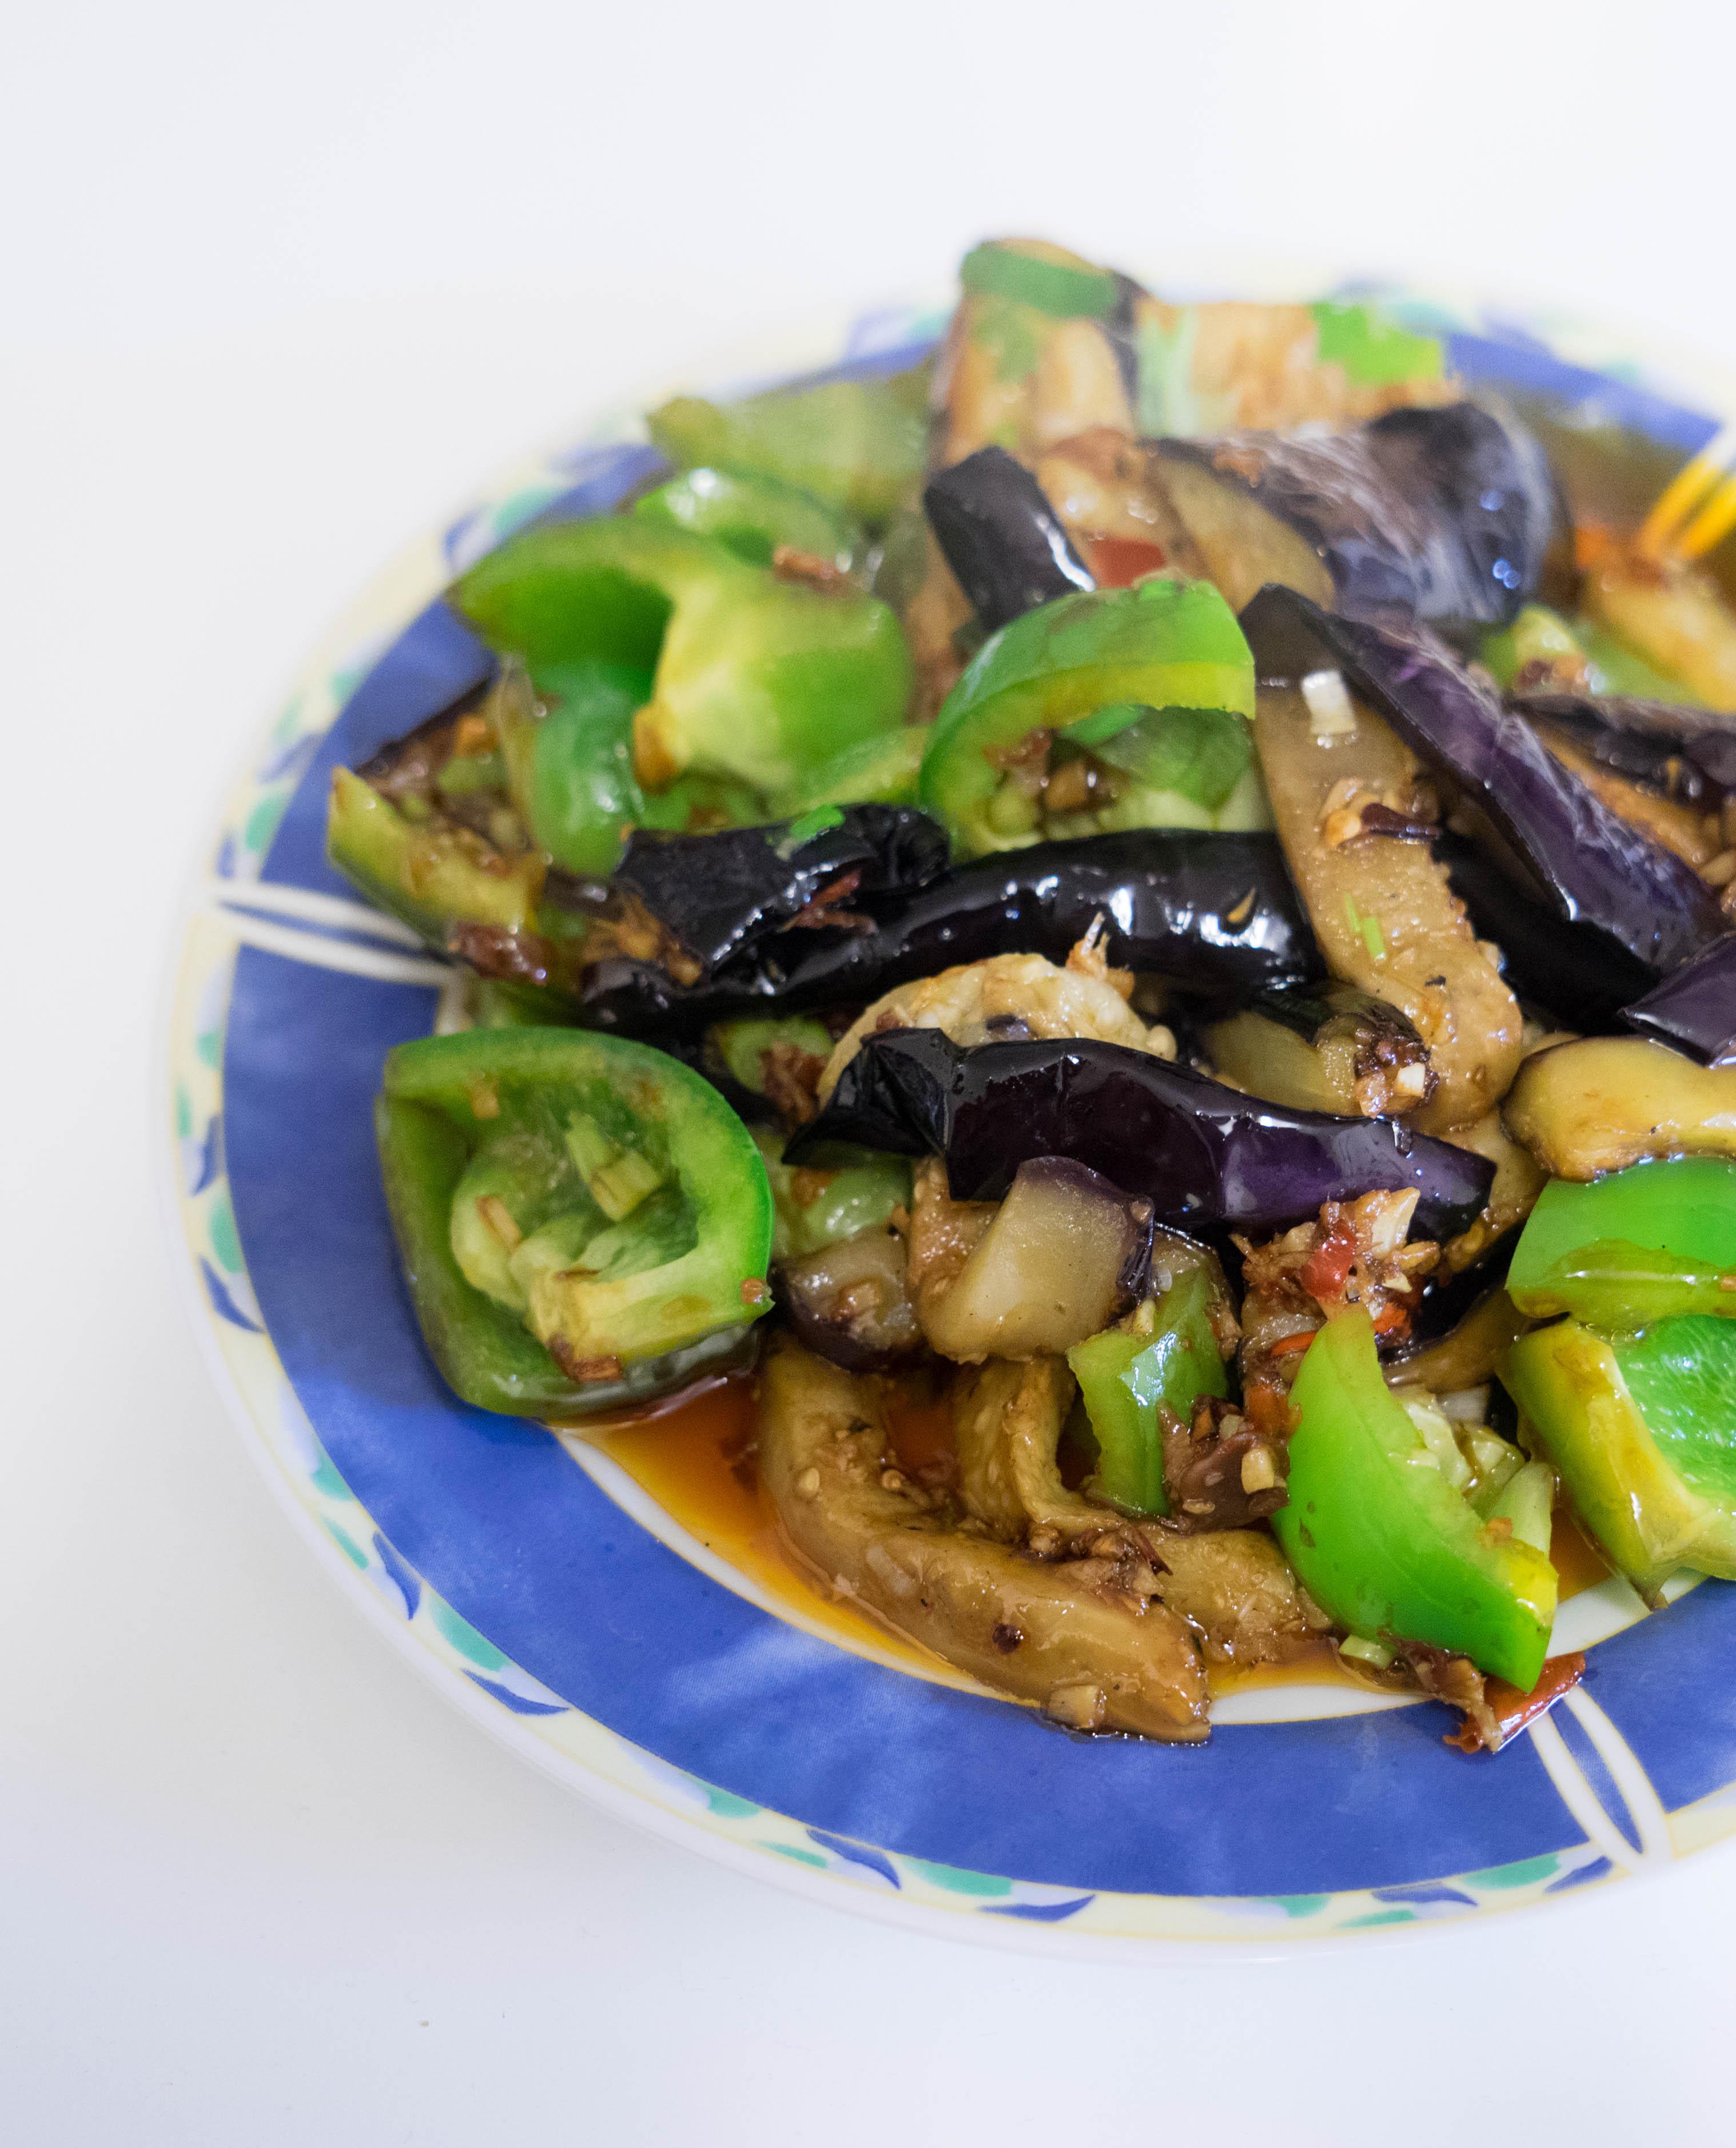 鱼香茄子-Chinesische Aubergine mit Fisch Duft